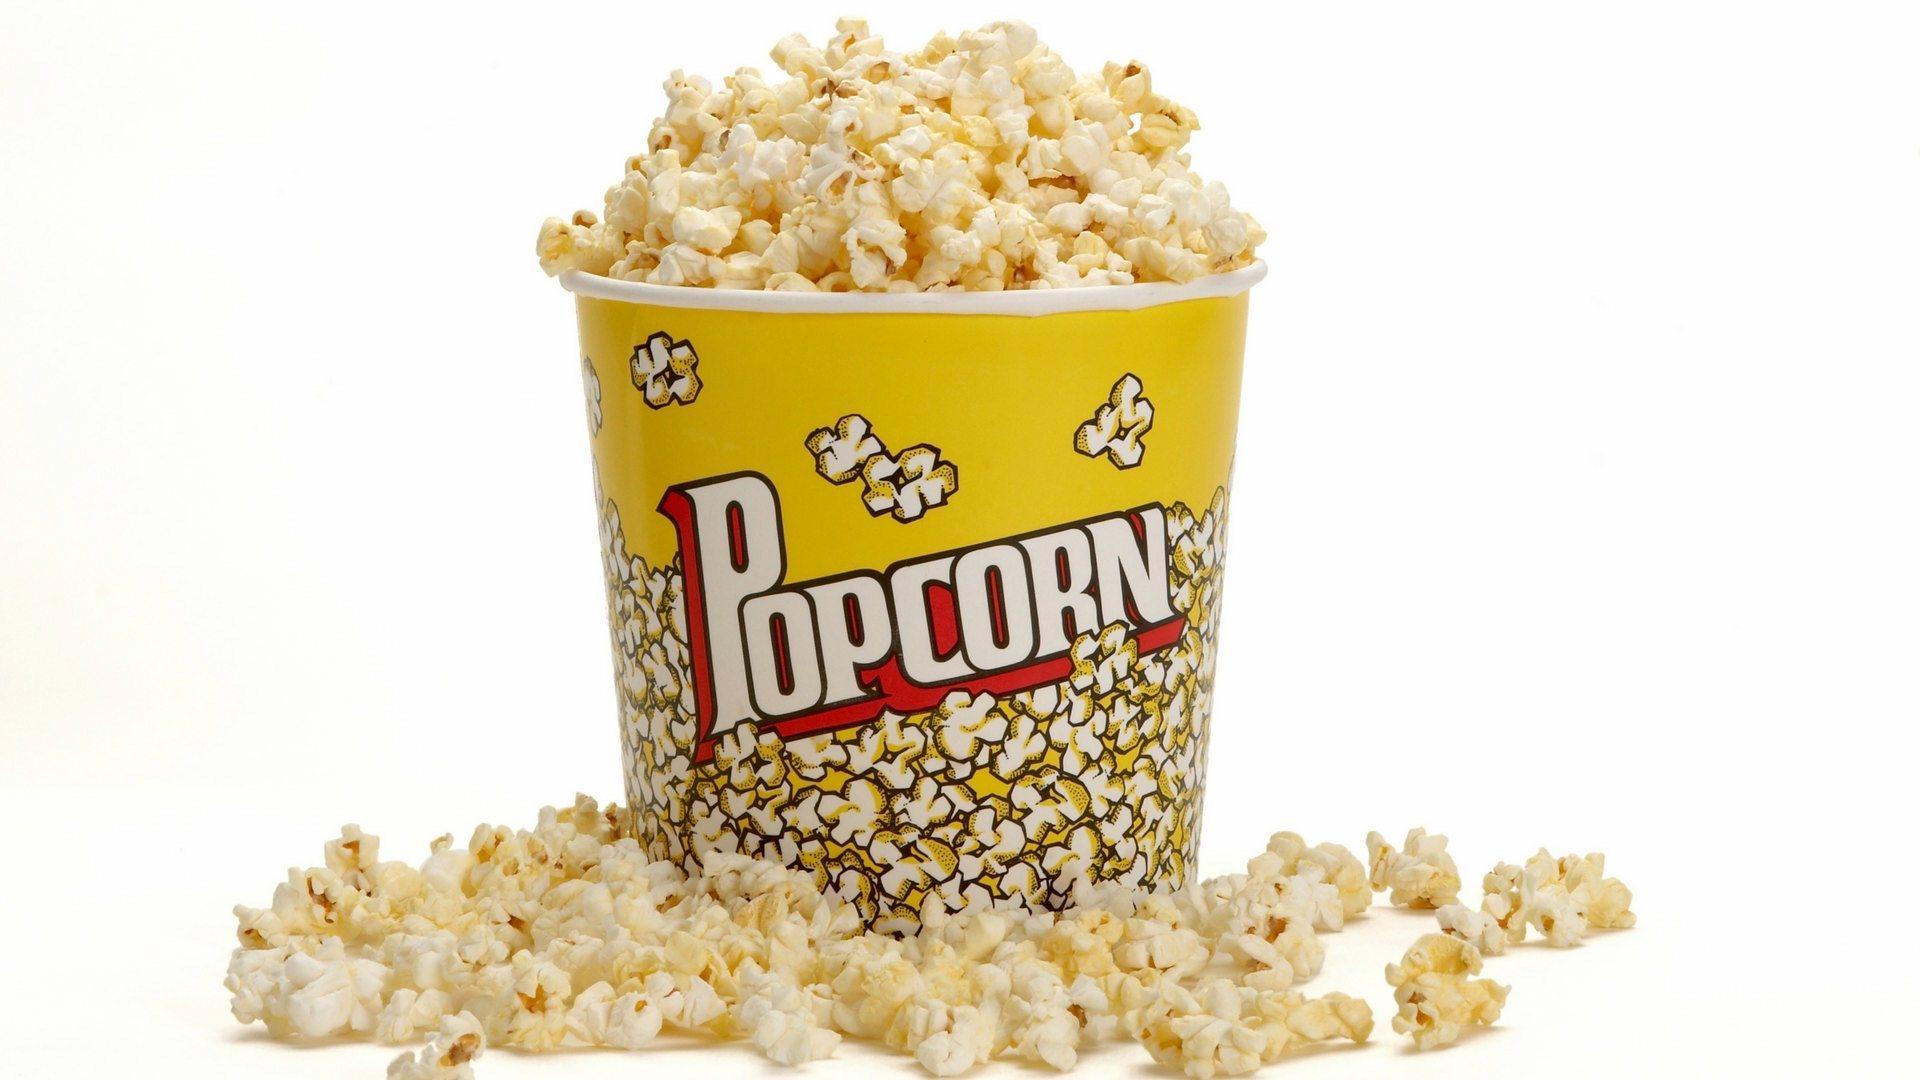 popcorn wallpaper background, wallpapers